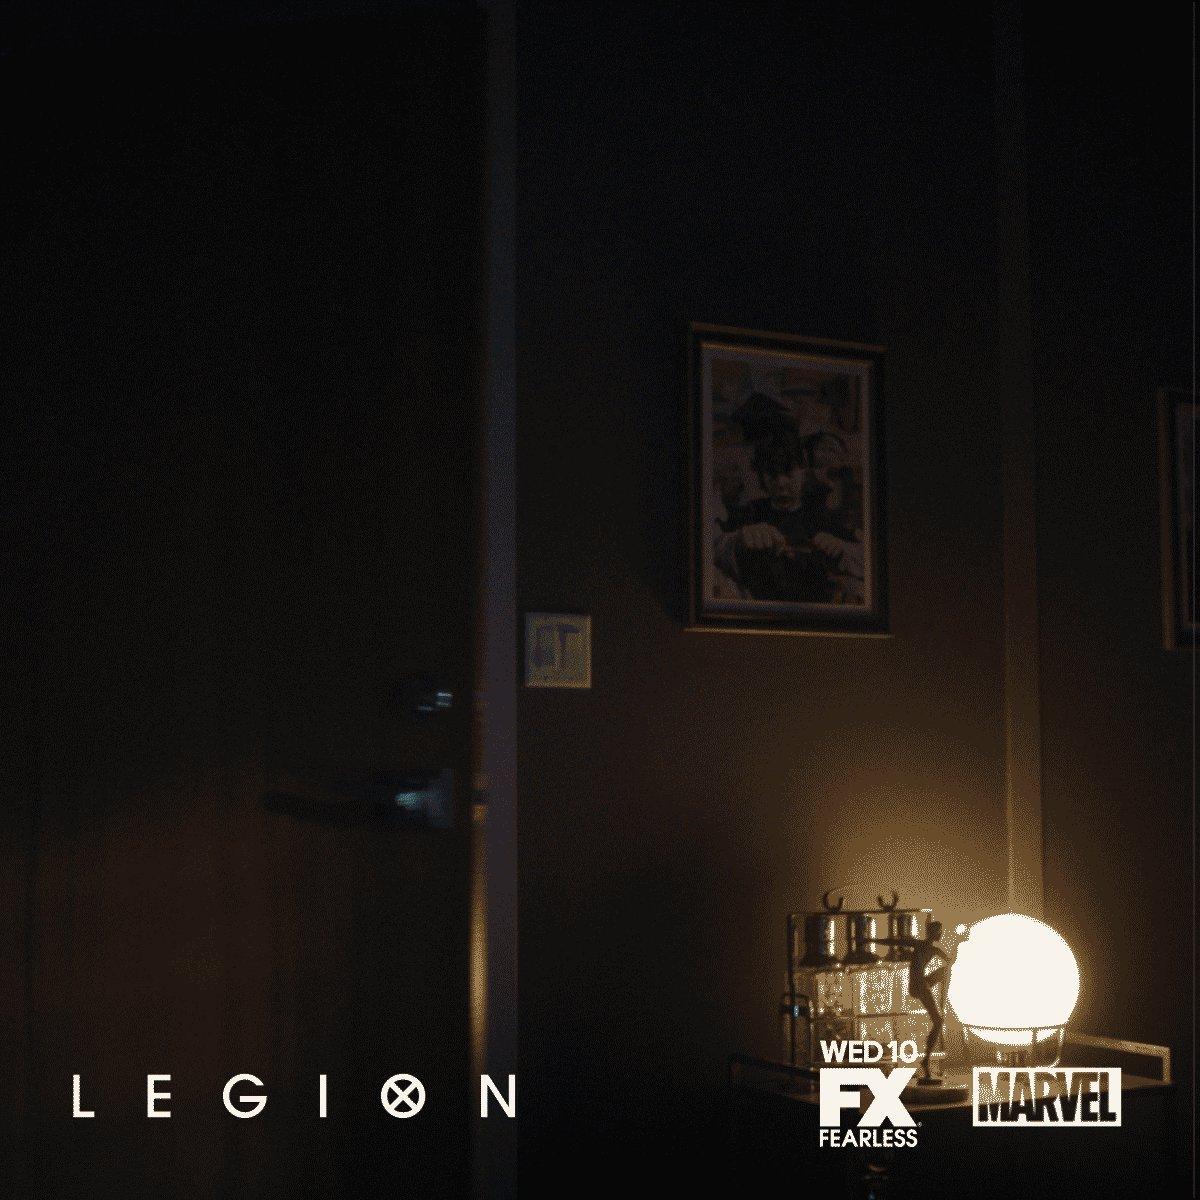 David is going through some things. #LegionFX https://t.co/J2fjtaOrHz